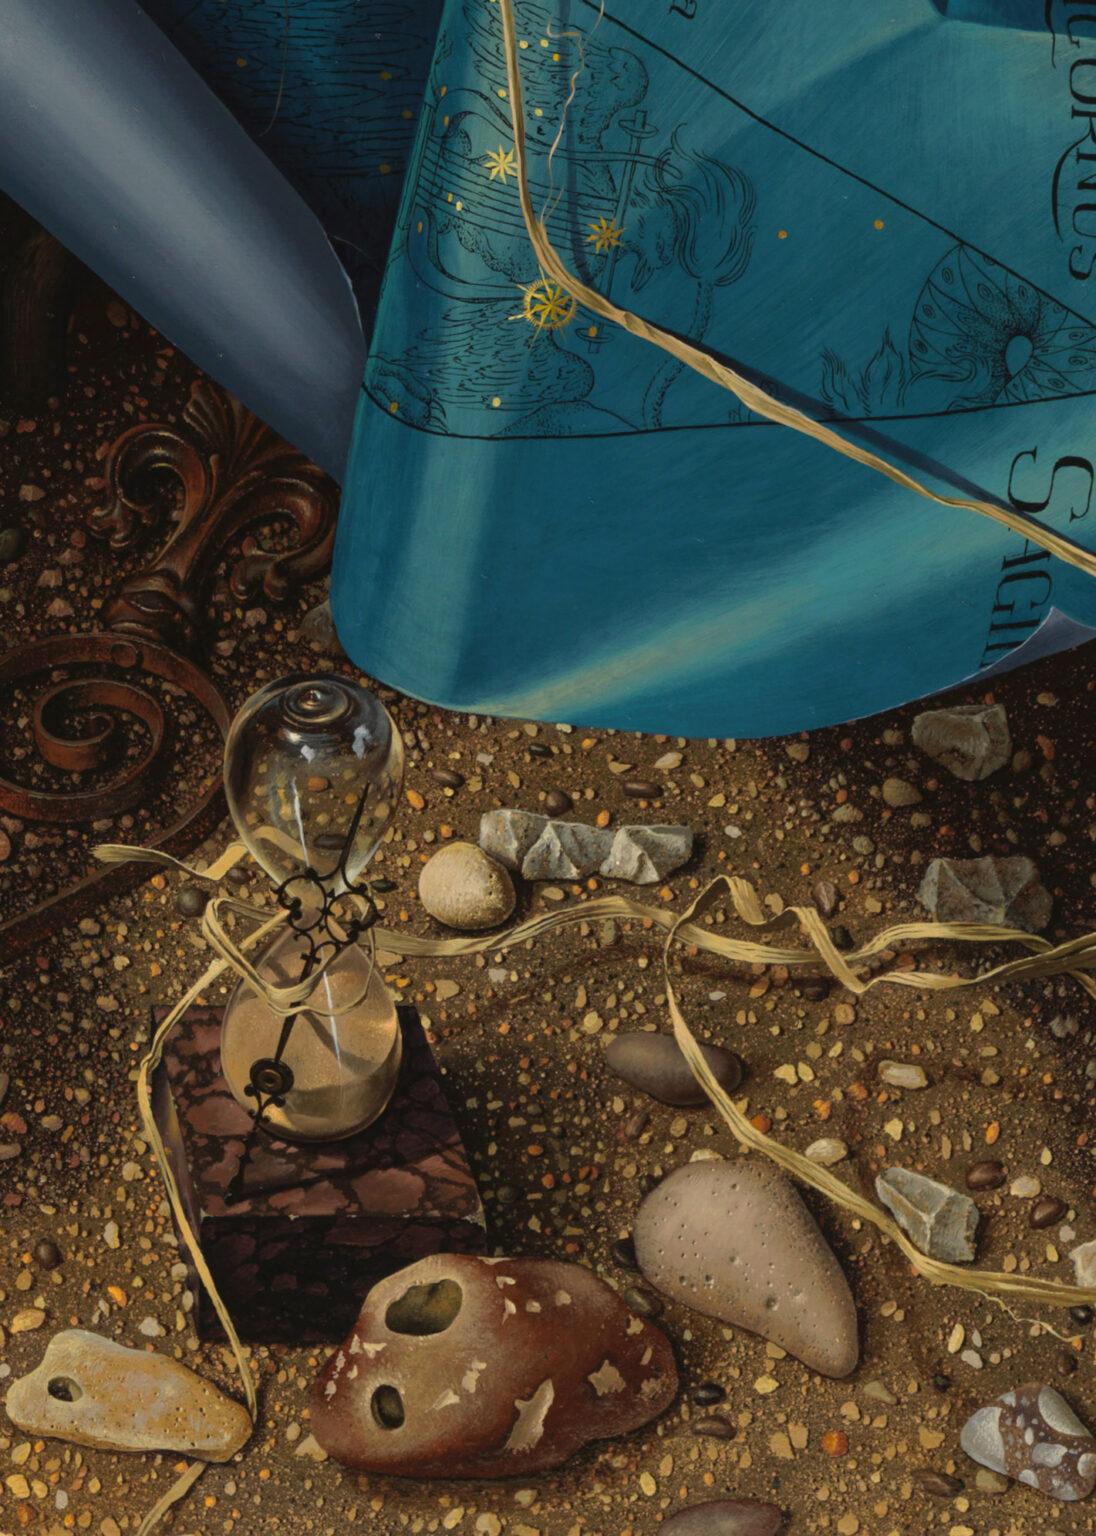 THE-HEAVENS-giclee-print-detail 3-Miriam-Escofet